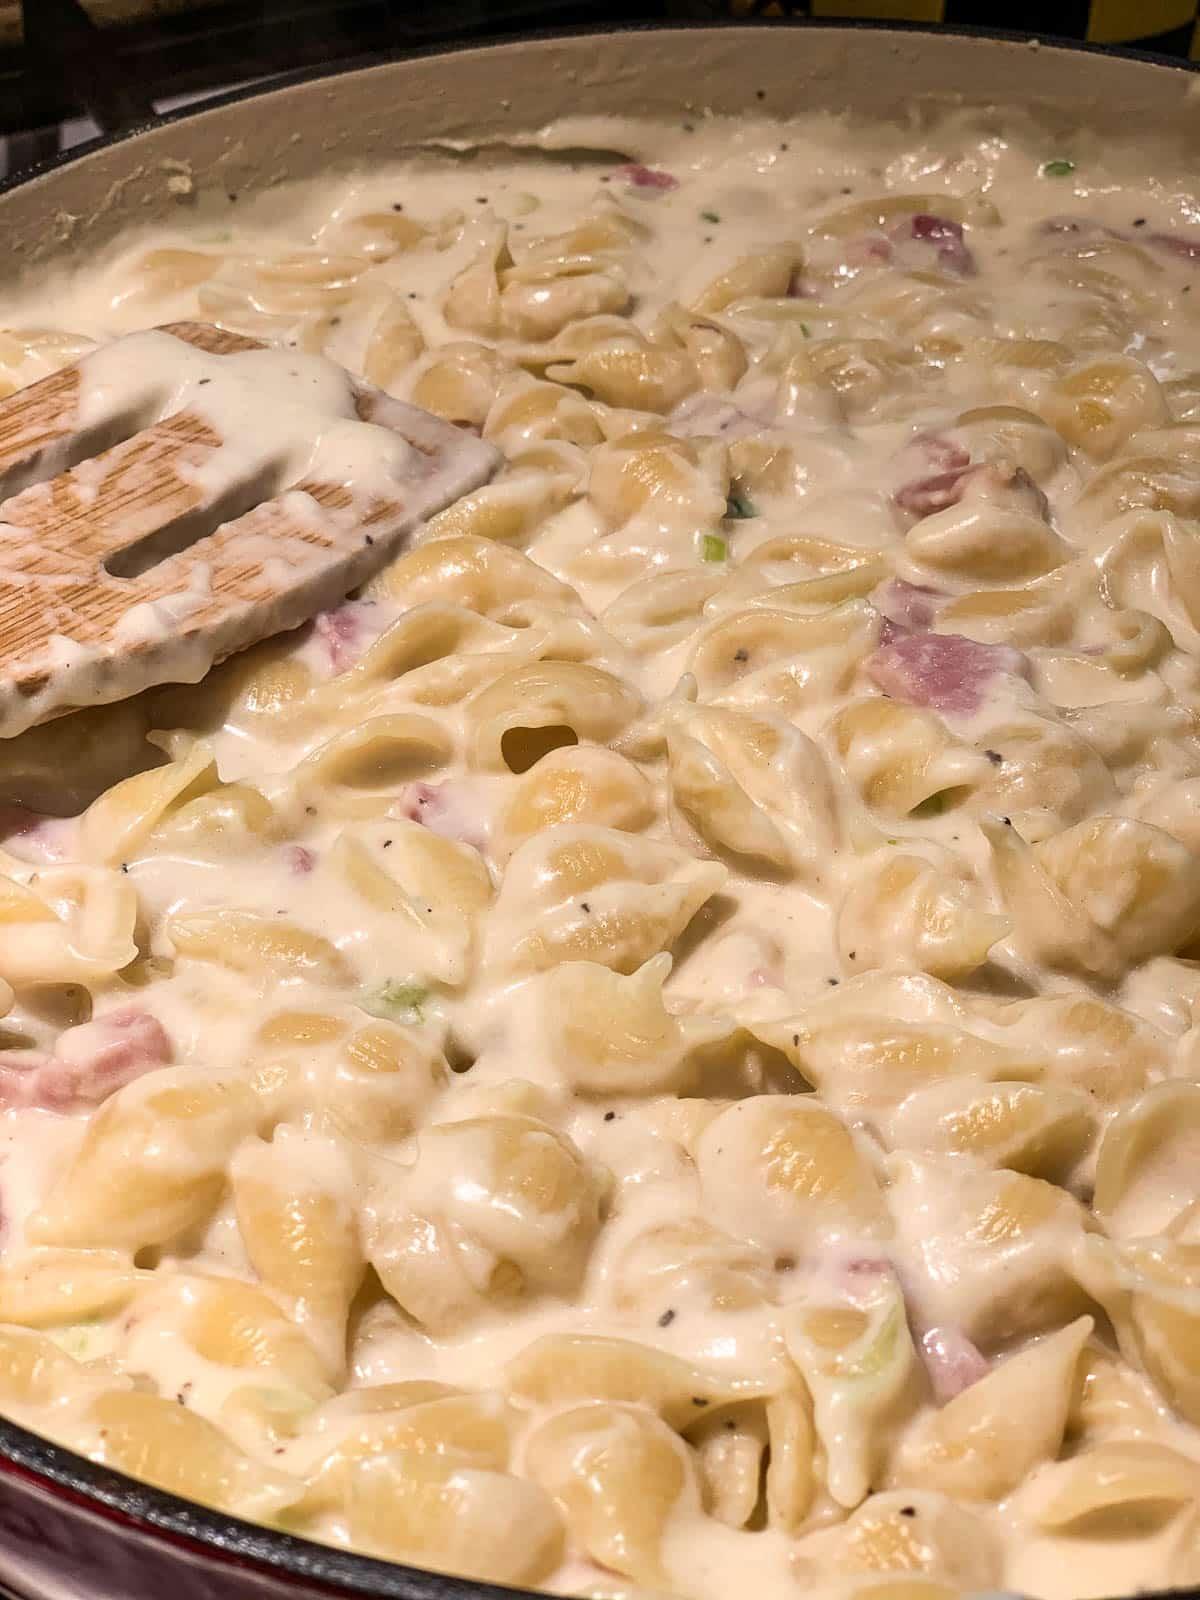 macaroni in cheese mixture